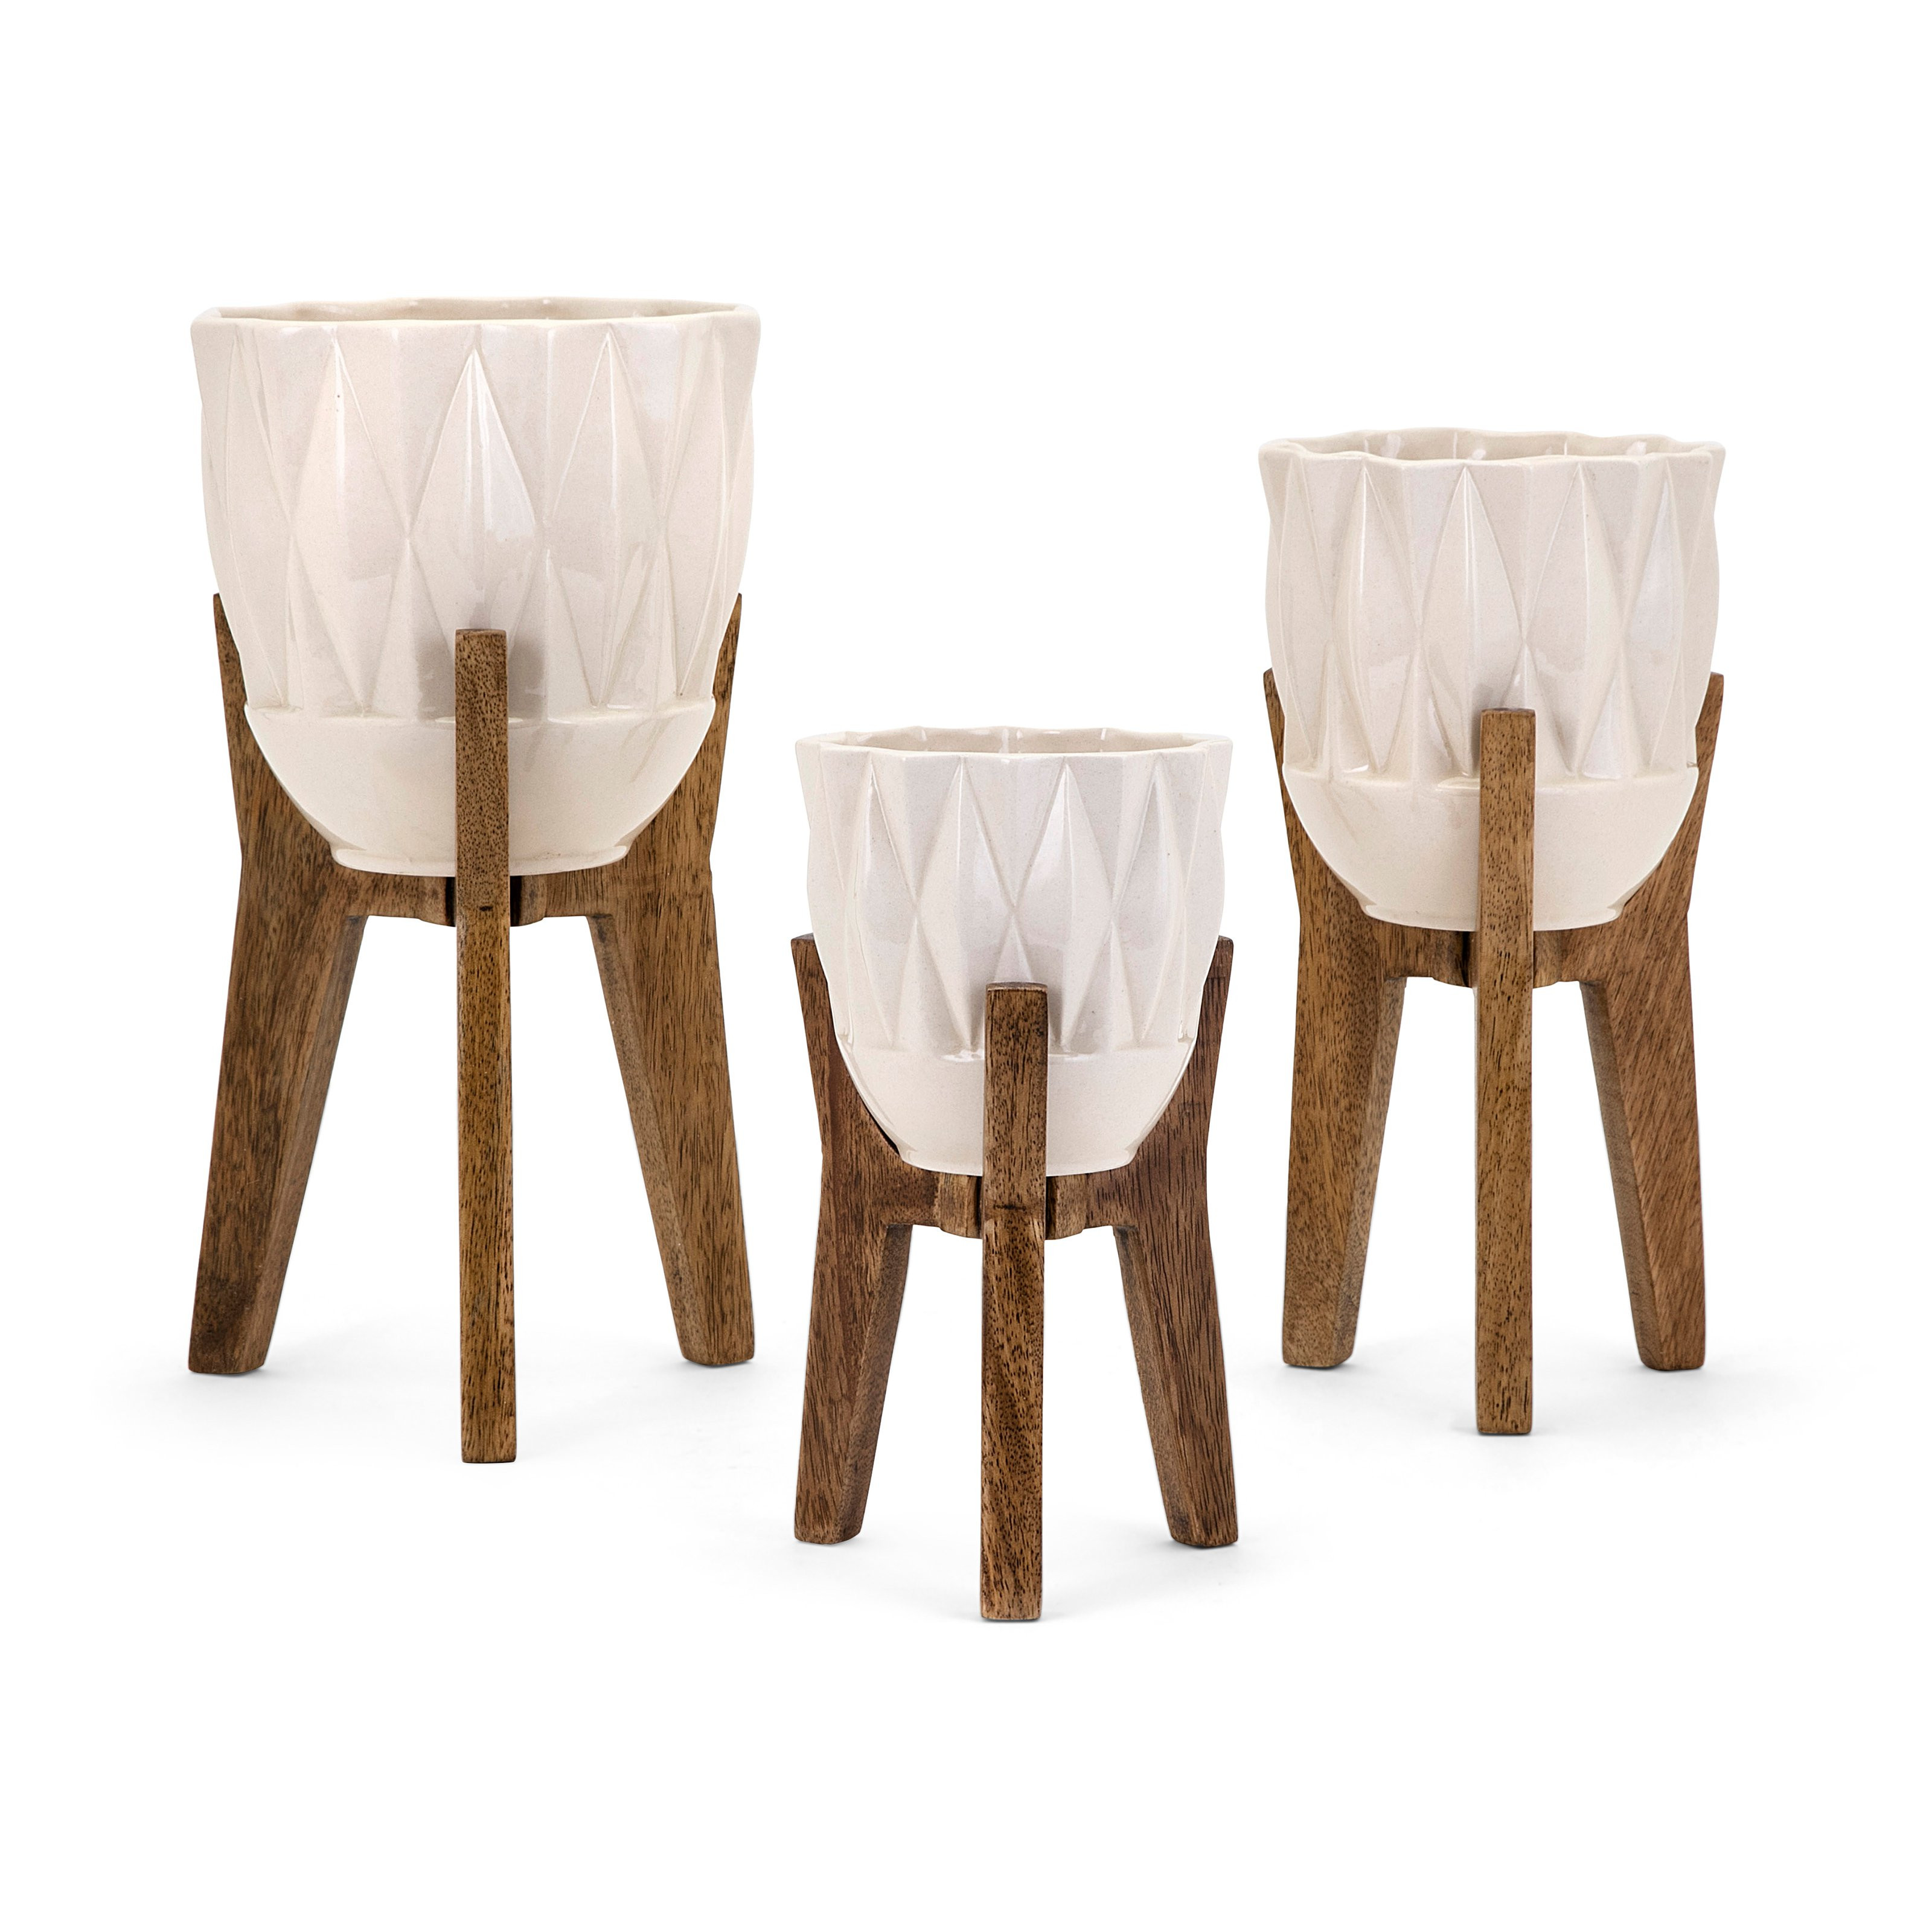 imax agatha ceramic vases set of 3 of imax amara table vase on wood stand set of 3 hayneedle with regard to masterxma6380